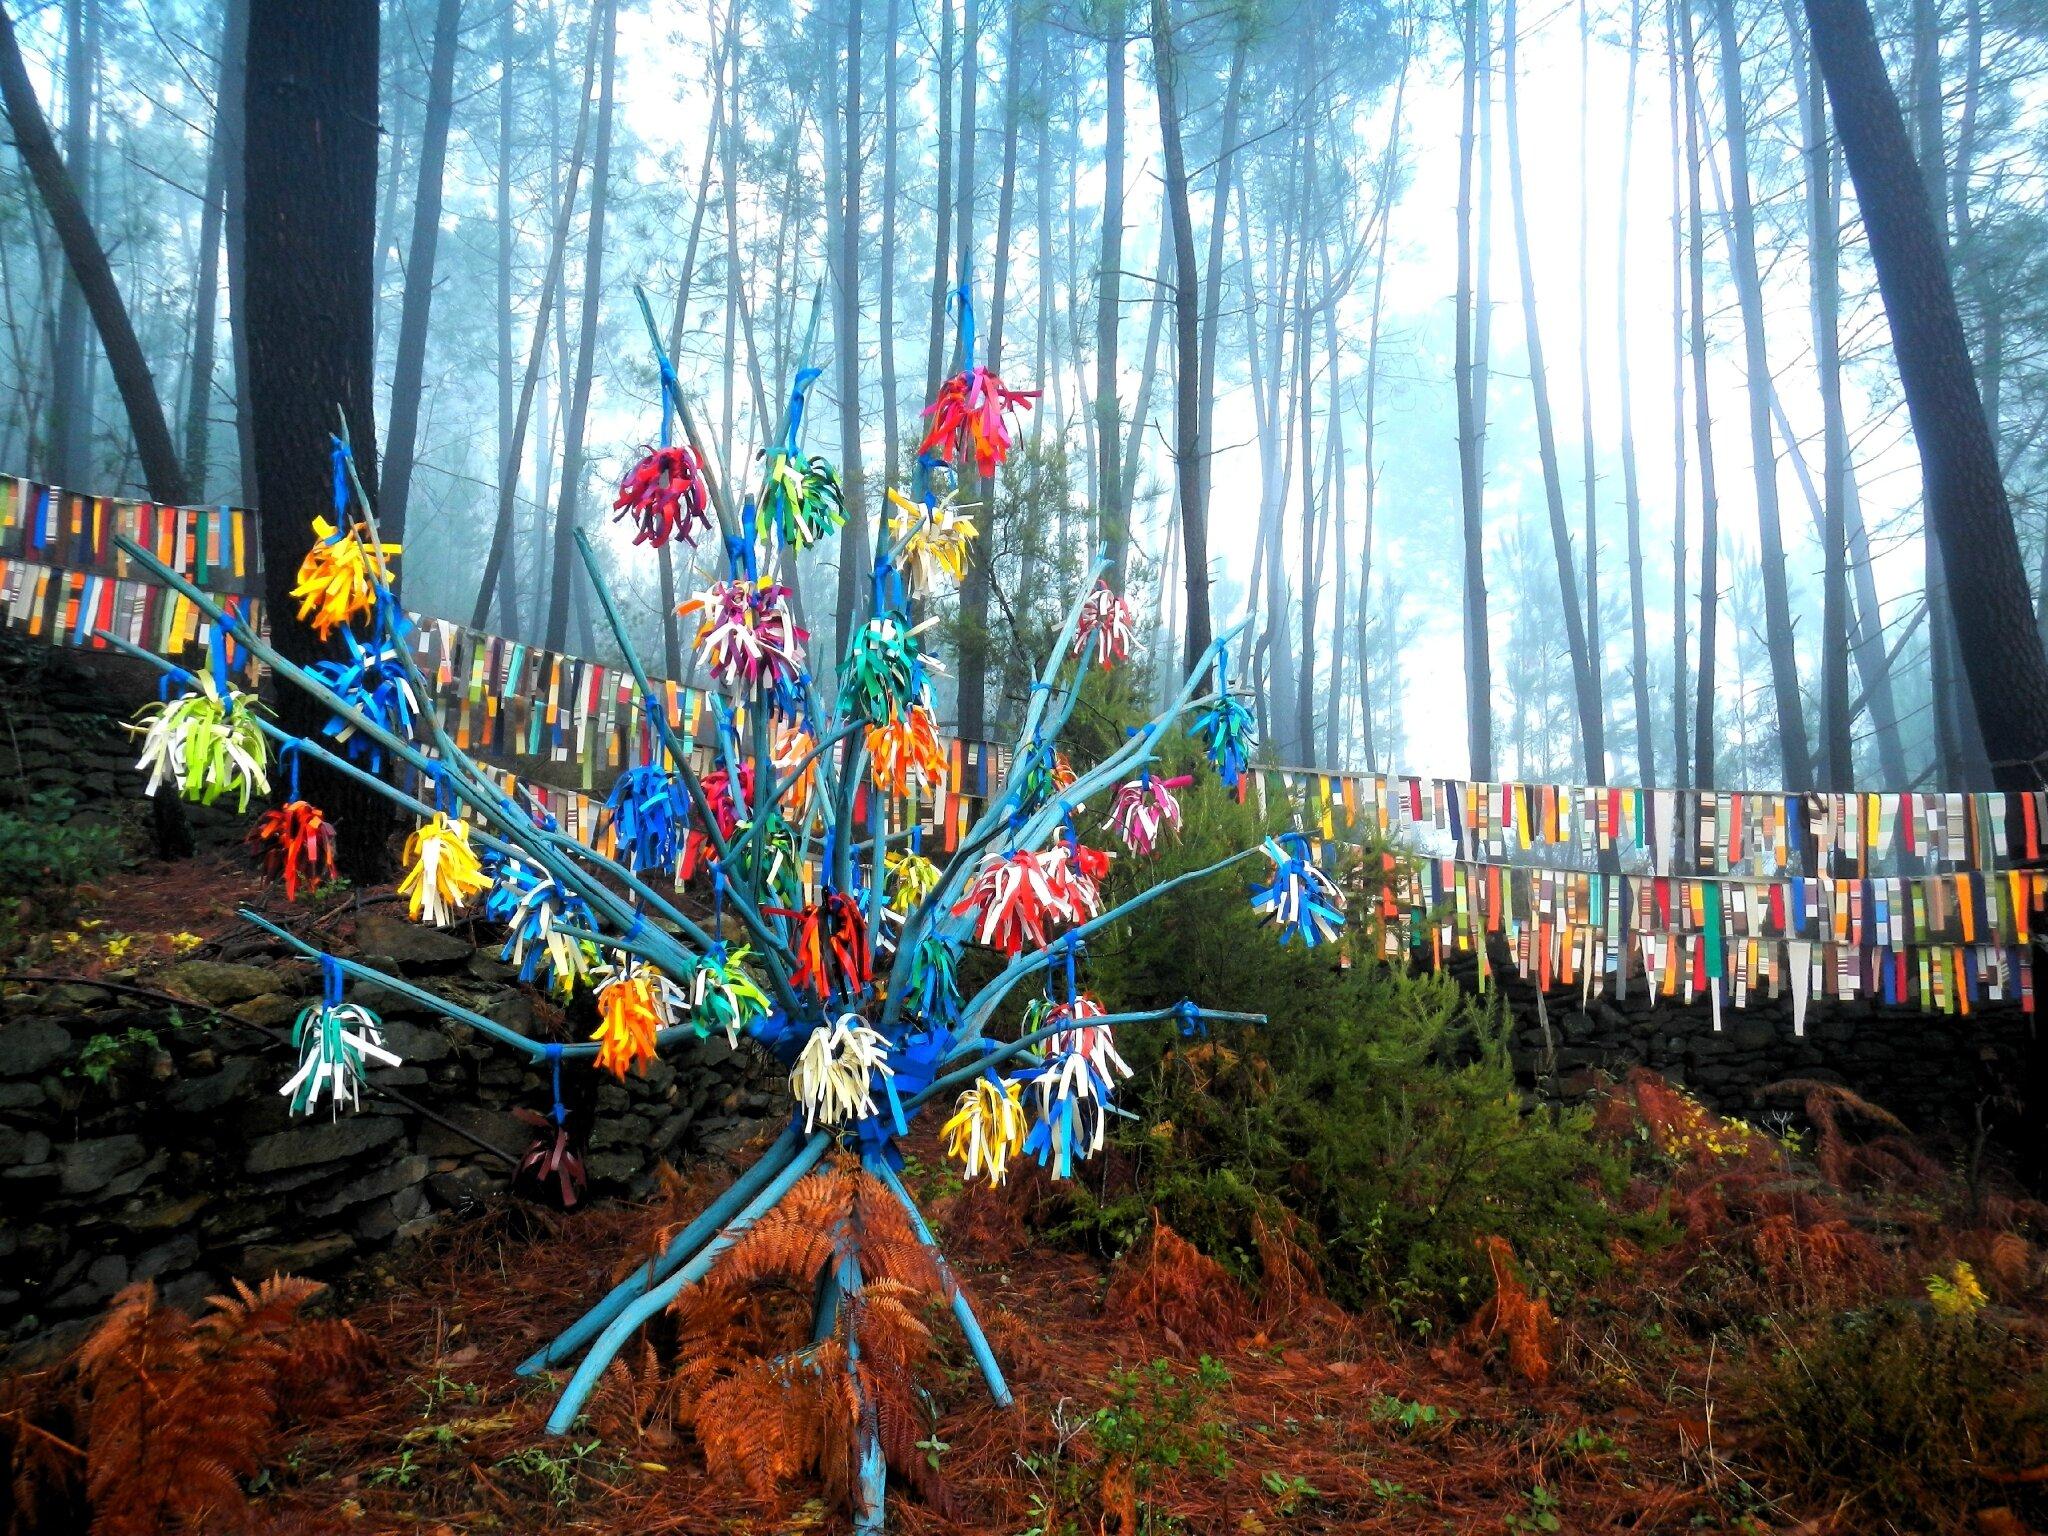 arbre aux exubérances multicolores sylvart yurtao